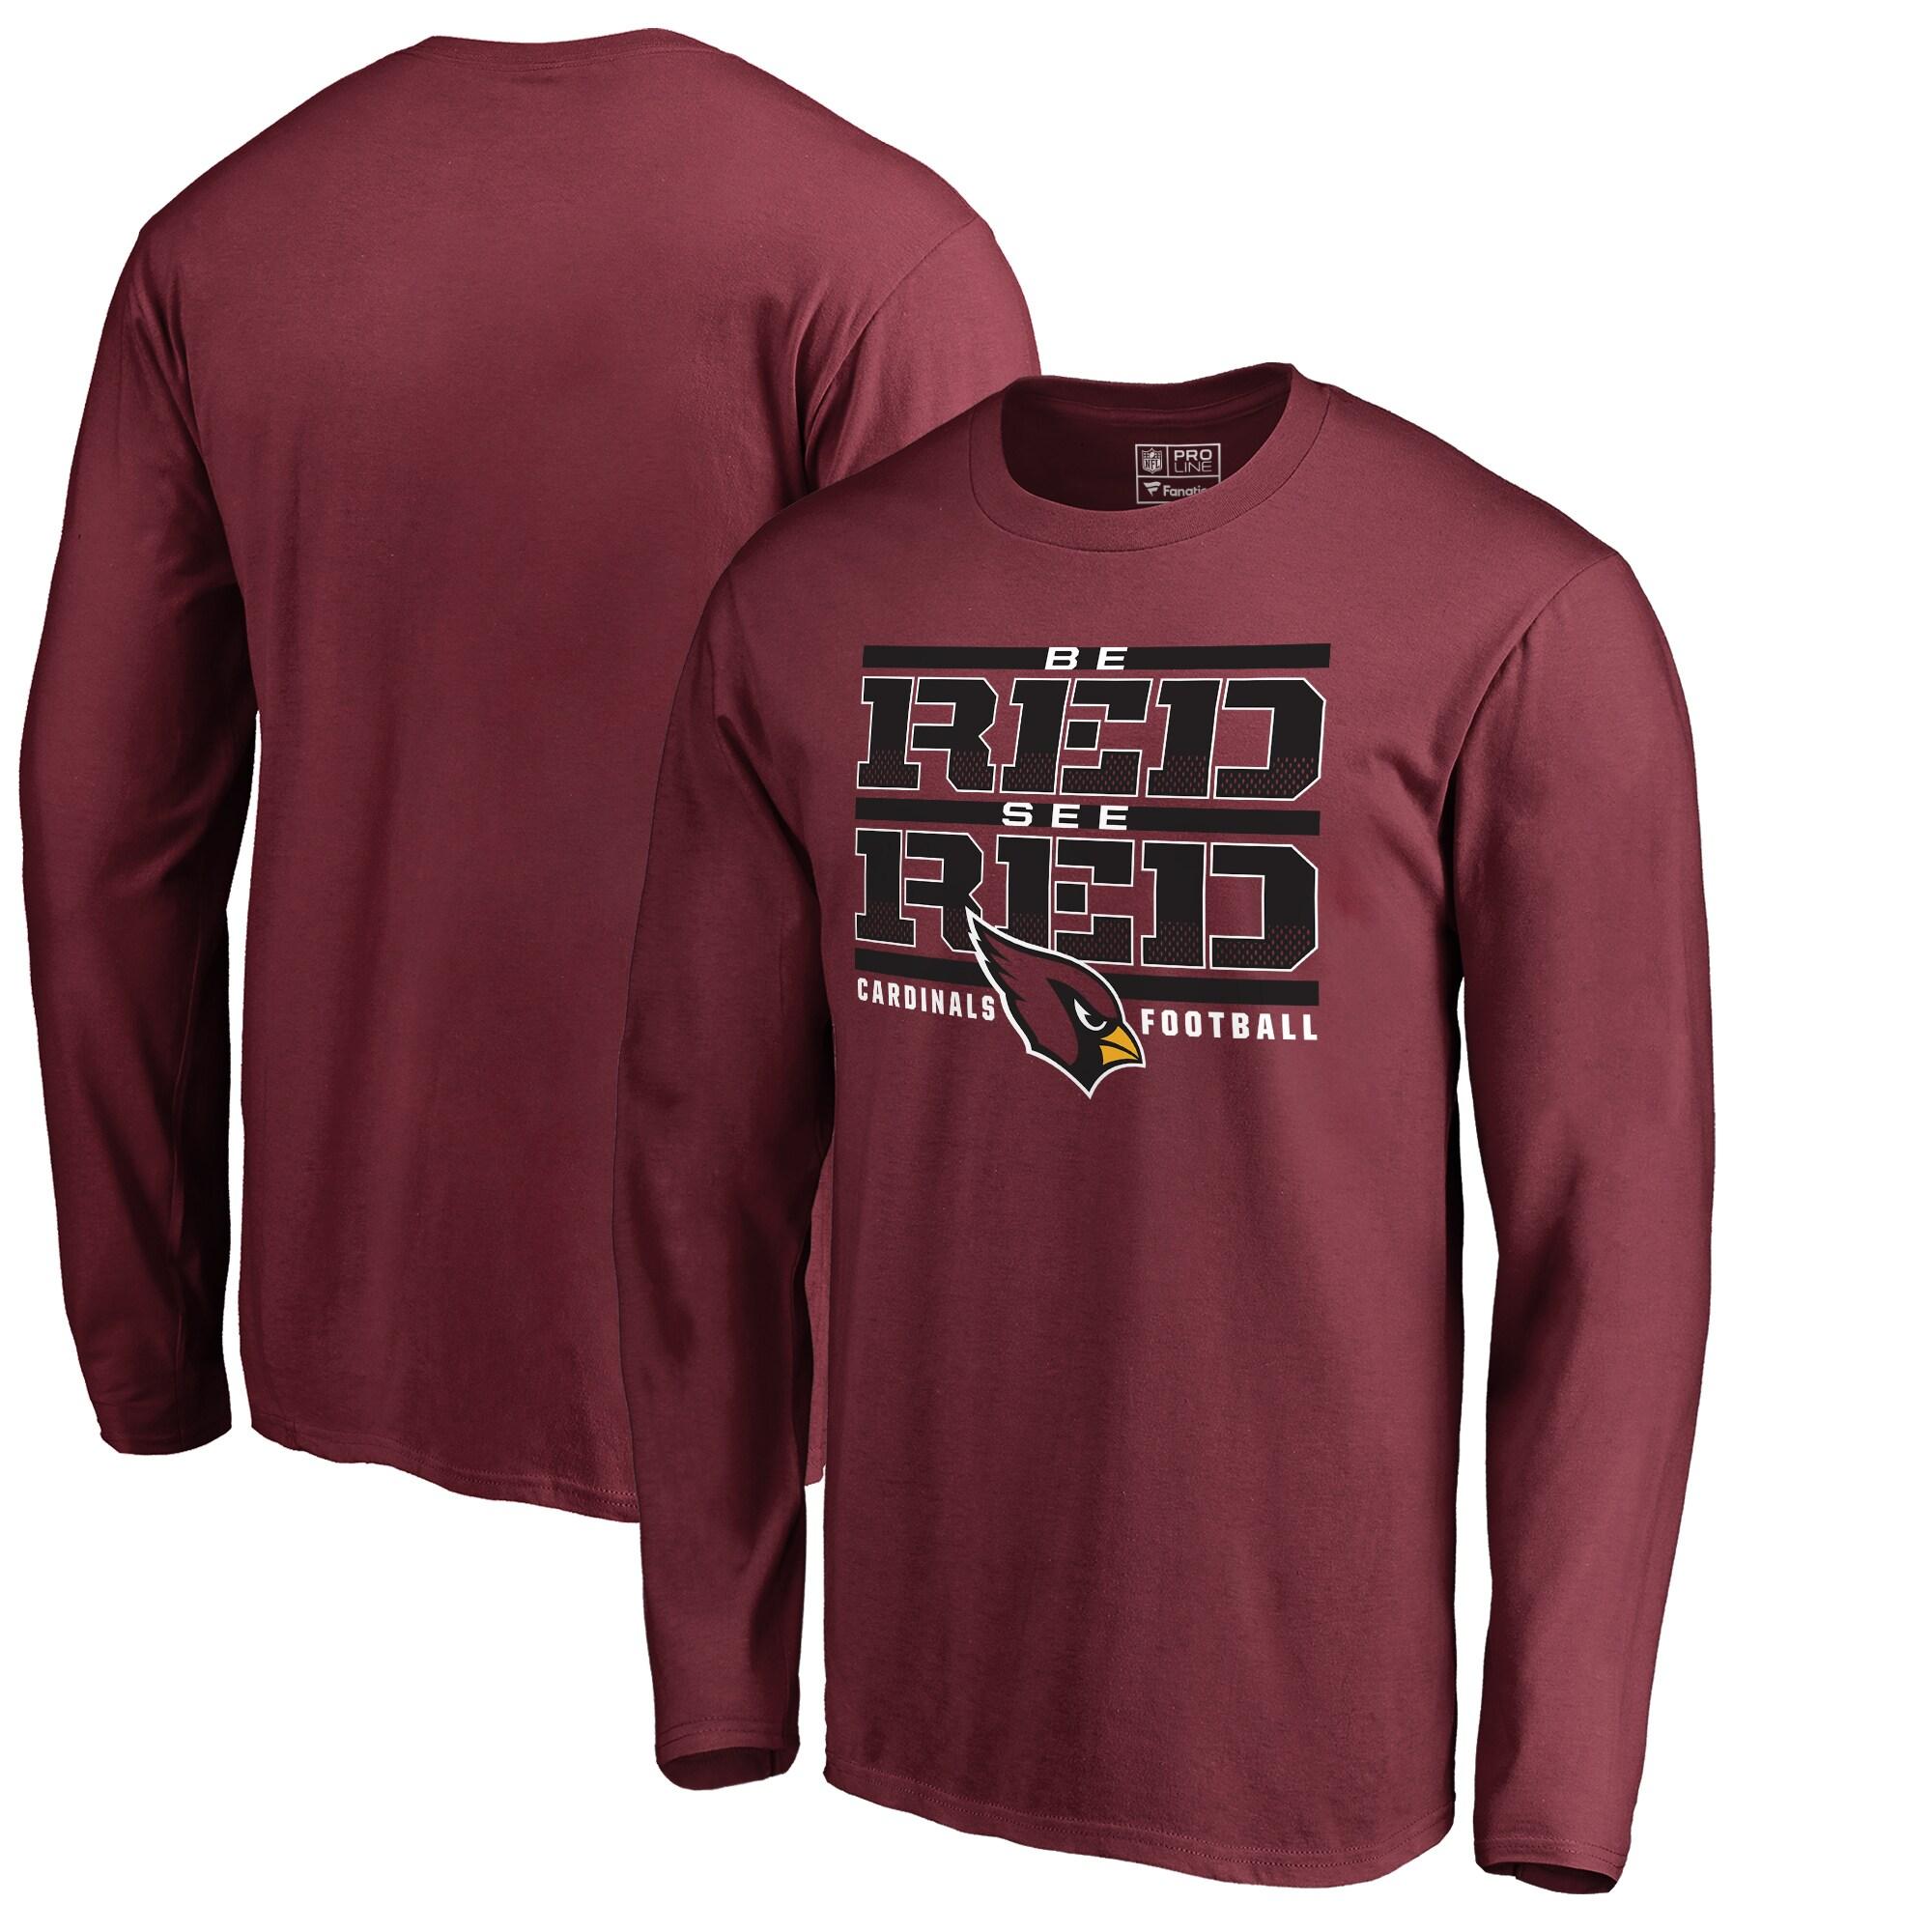 Arizona Cardinals NFL Pro Line by Fanatics Branded Hometown Collection Long Sleeve T-Shirt - Cardinal